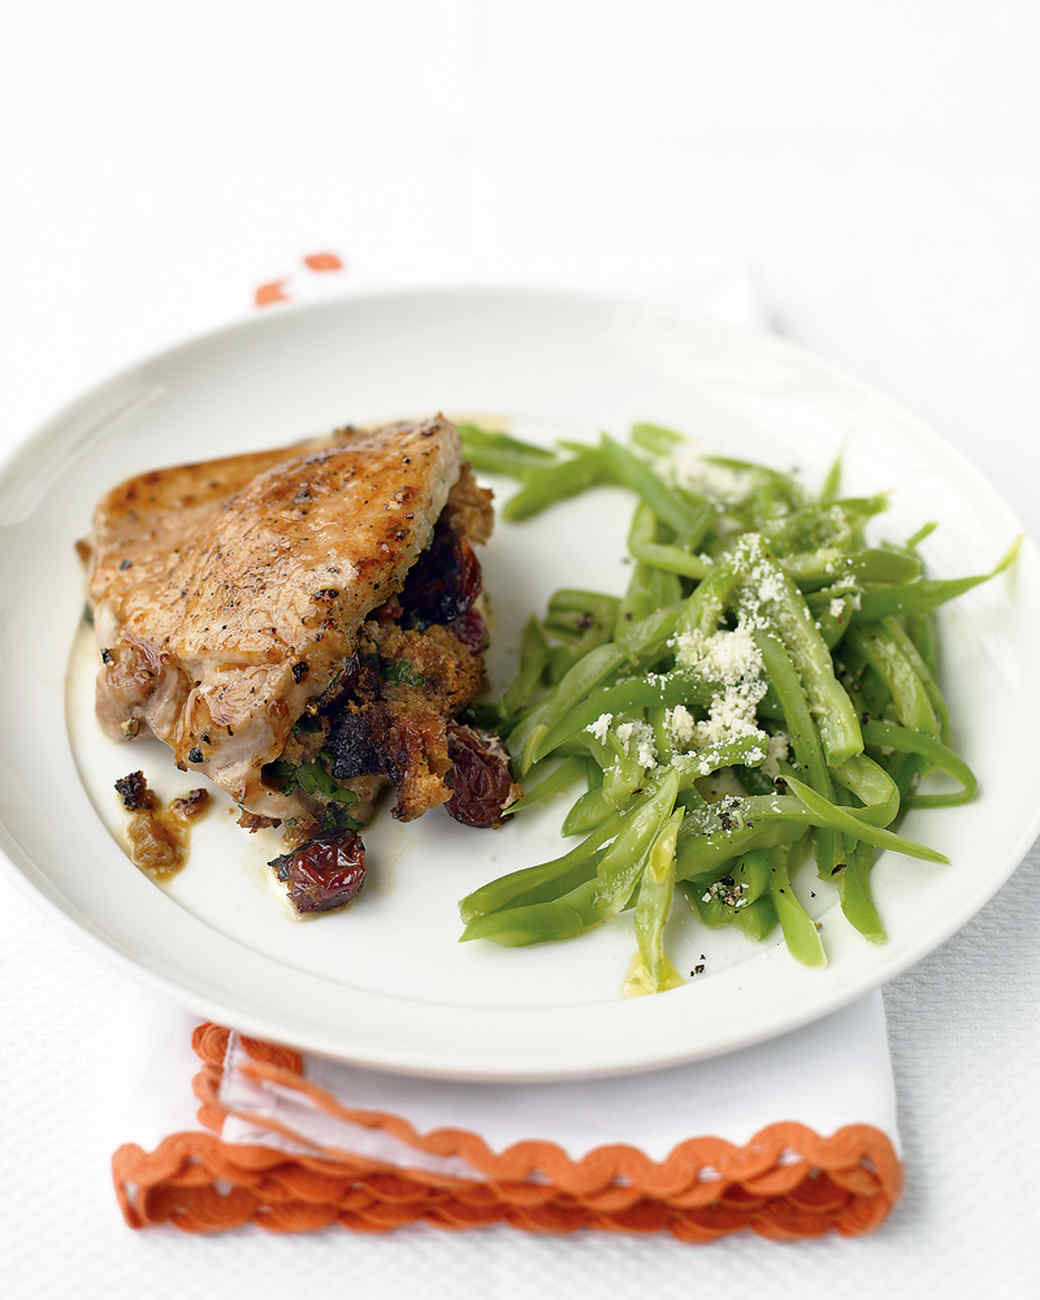 Raisin-and-Bread-Stuffed Pork Chops